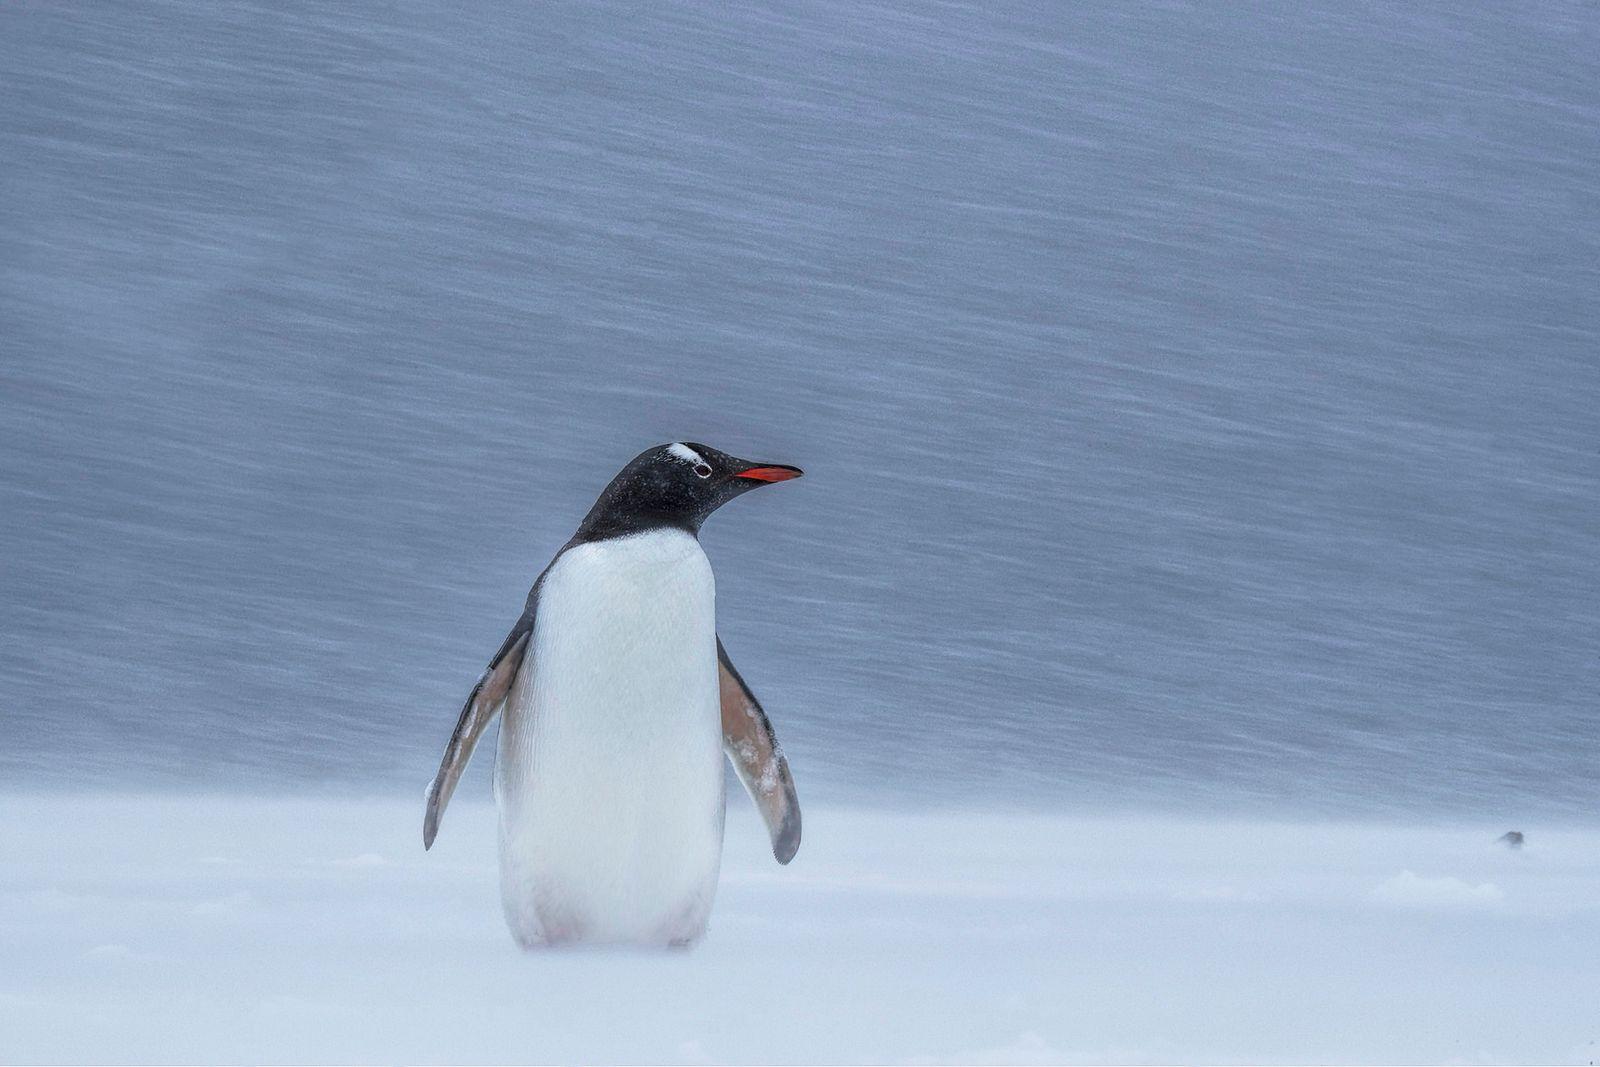 Penguin snowstorm